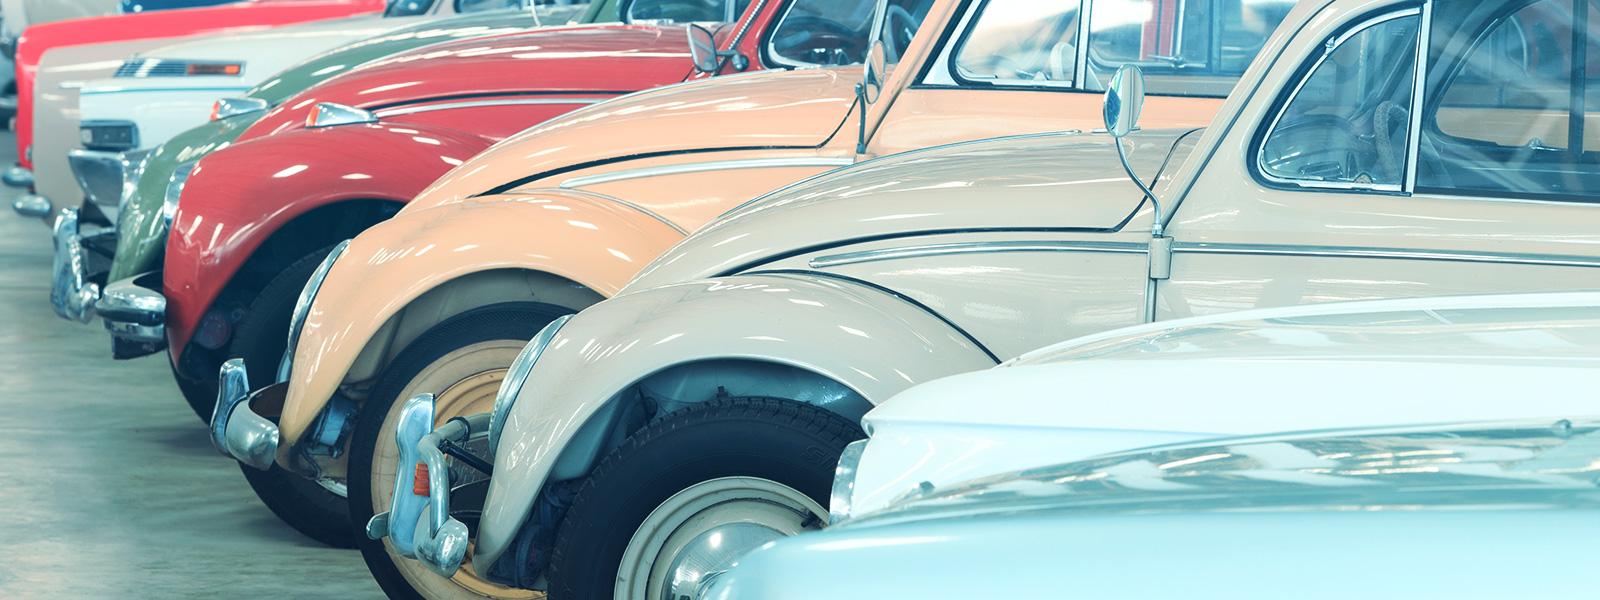 rastreador-carros-colecionadores-blog-ceabs